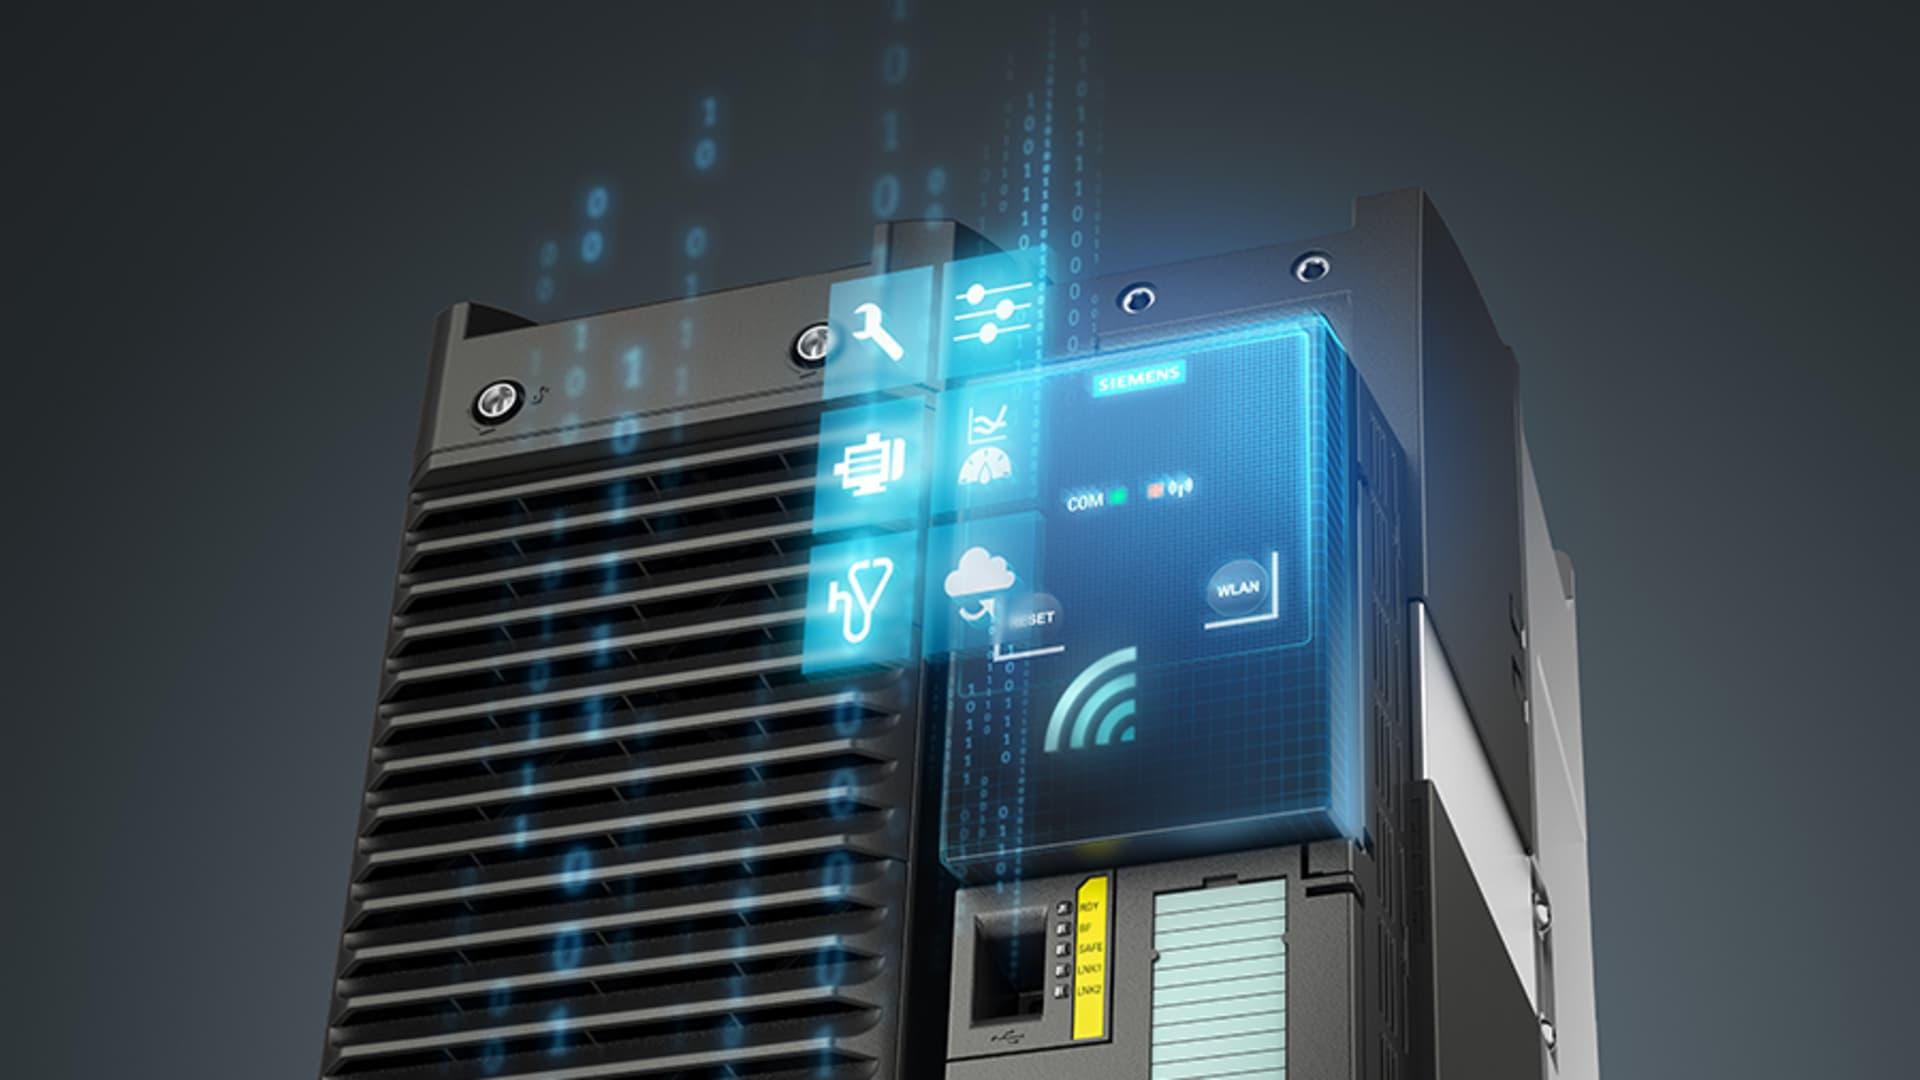 Sinamics g120 smart access module